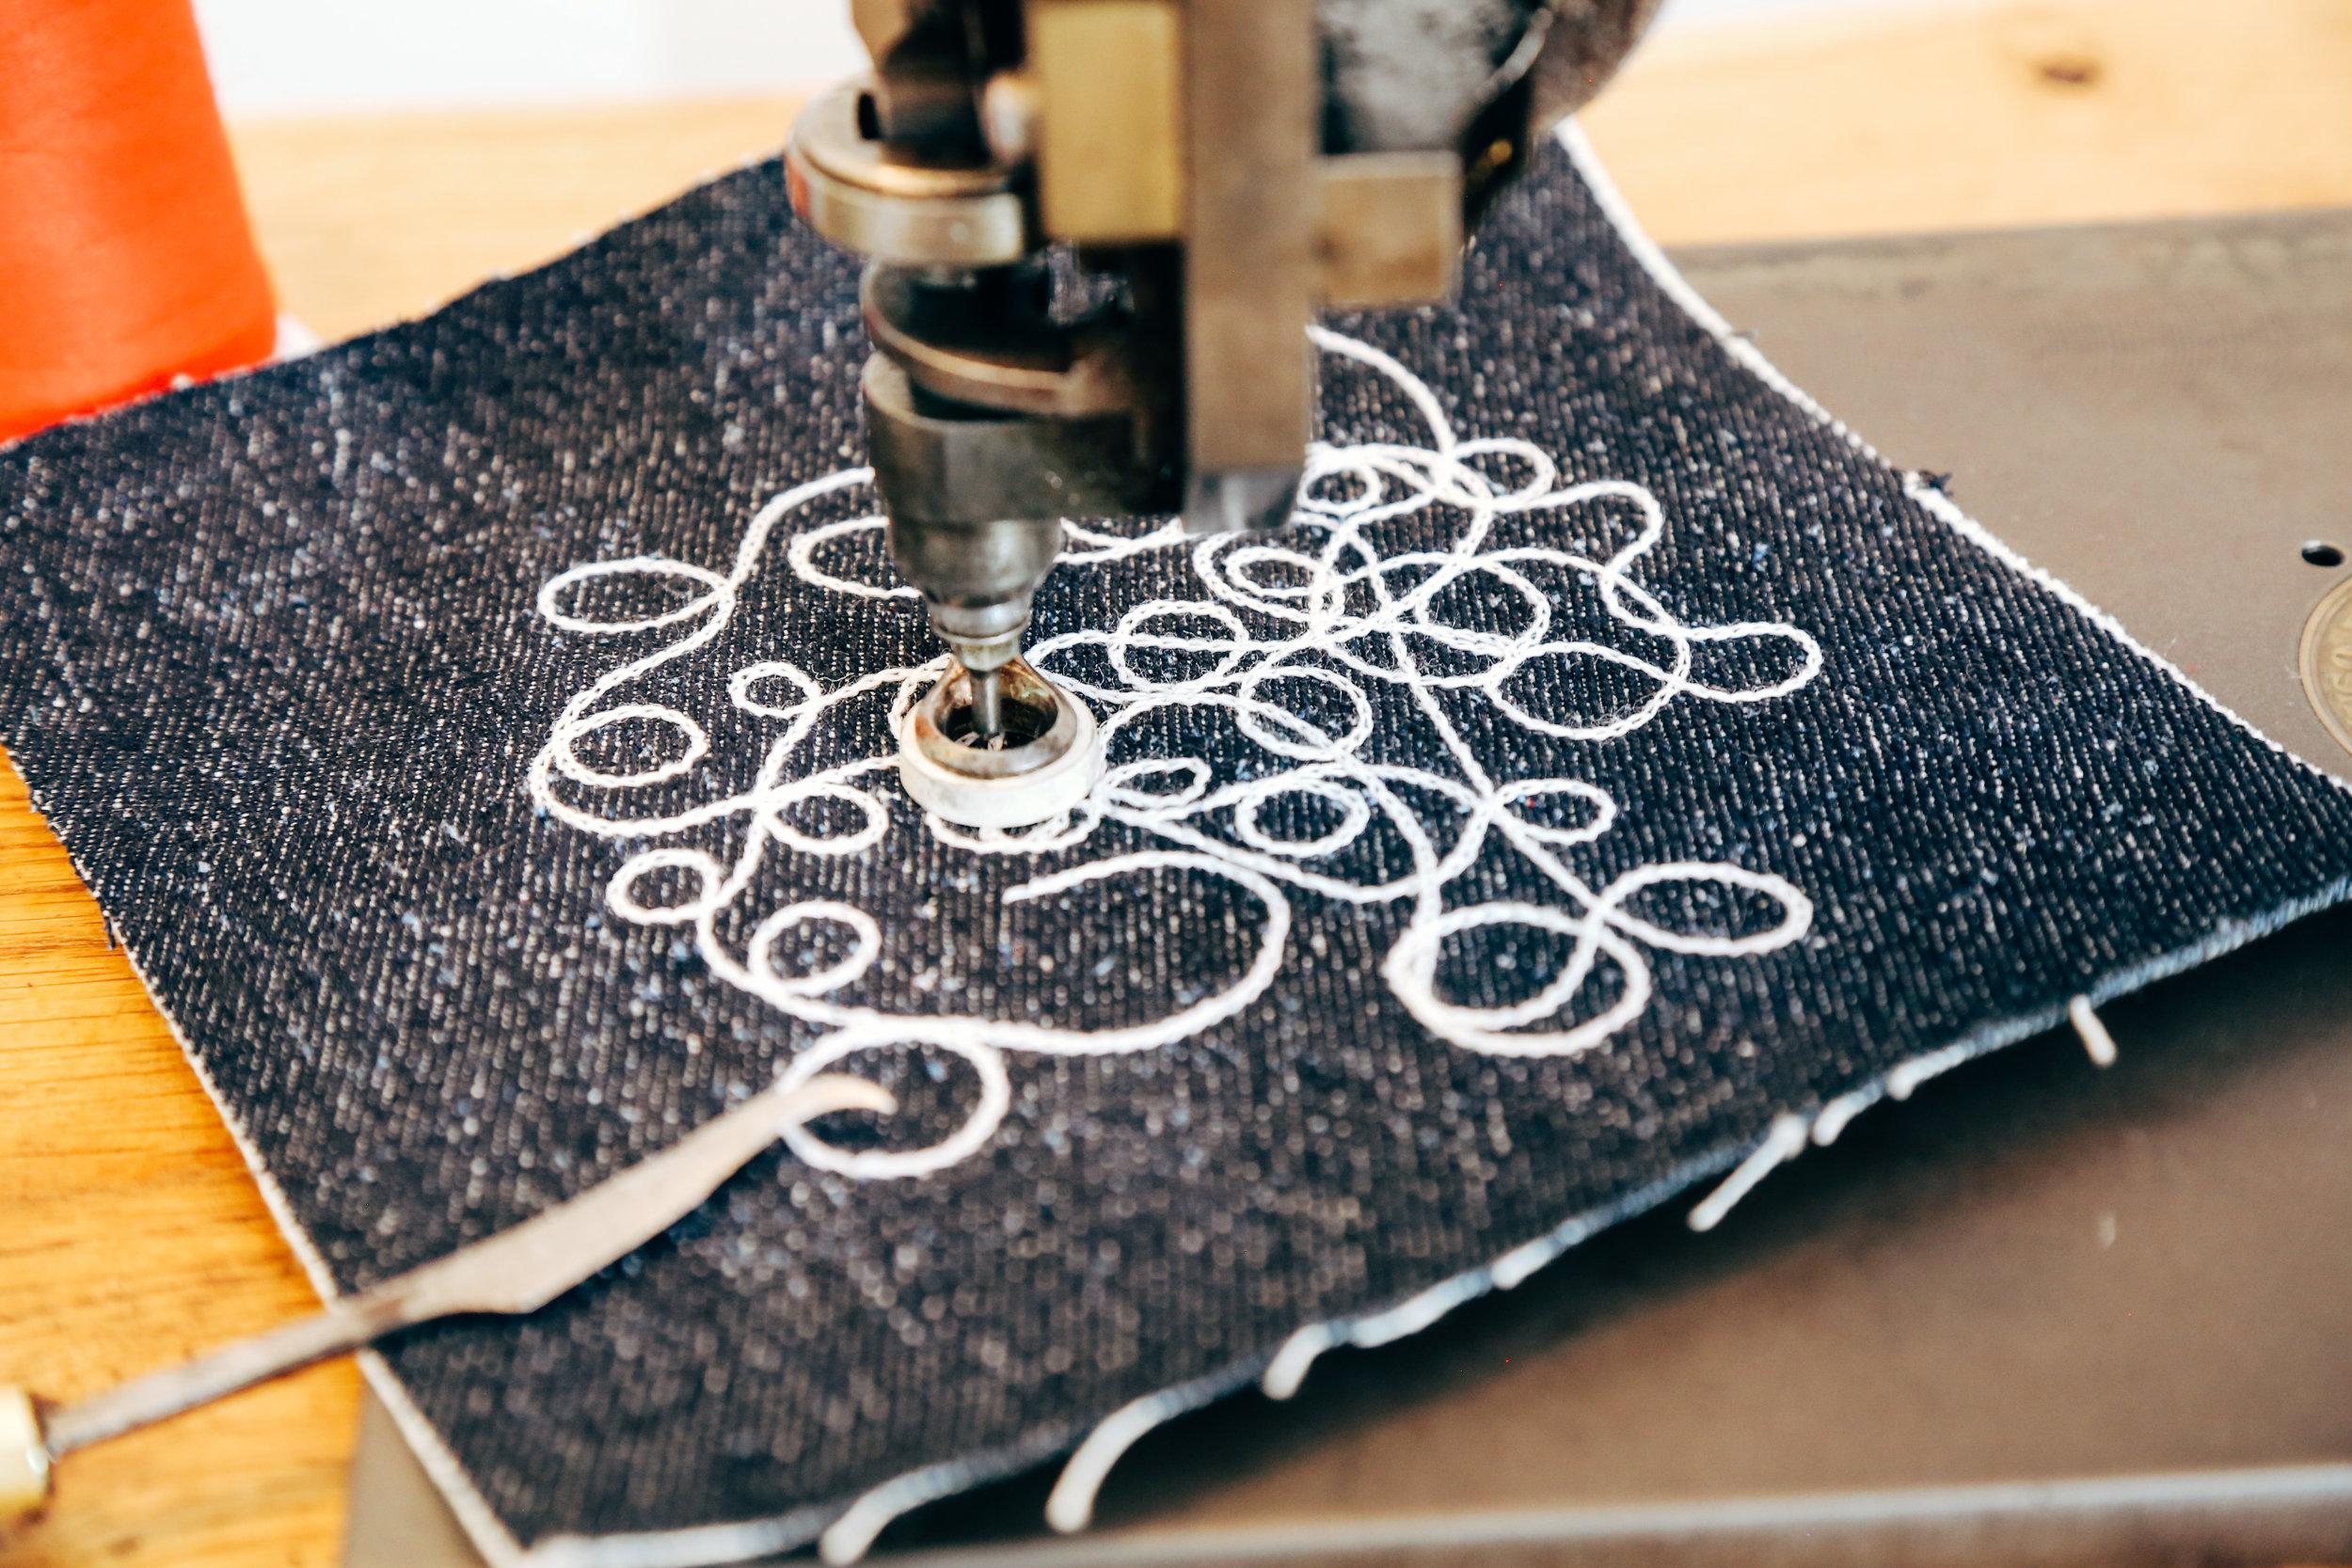 chainstitch-closeup-cornely-a-machine-moss-artisan-embroideryart.jpg